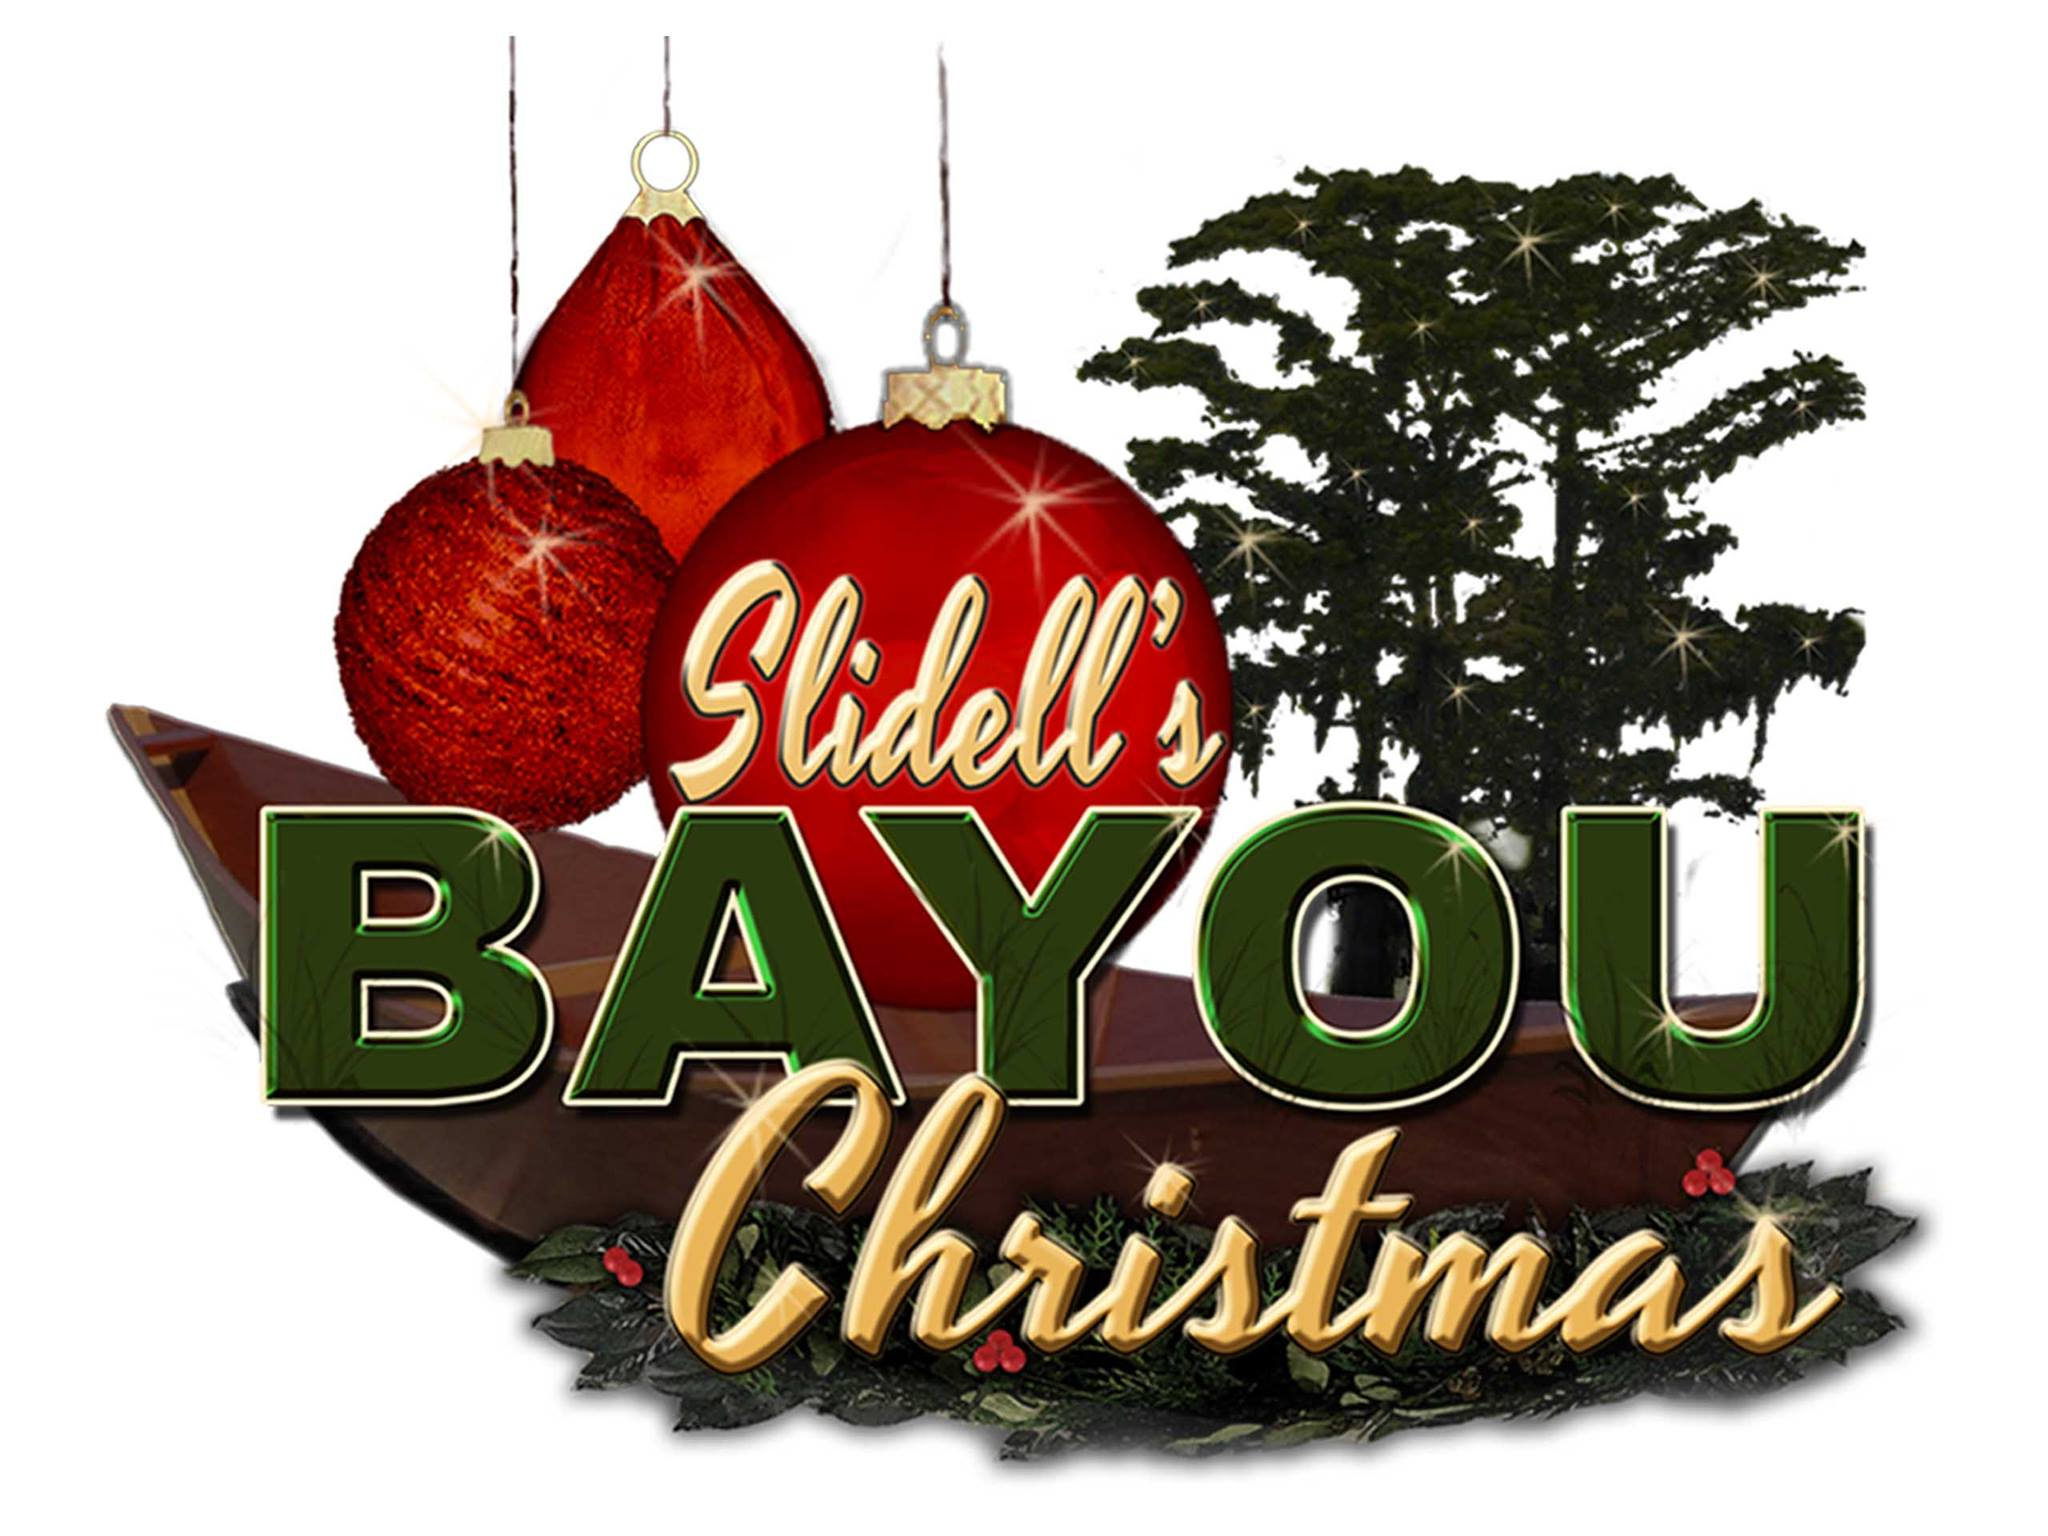 Slidell's Bayou Christmas Drive Thru Light Display | Slidell, LA